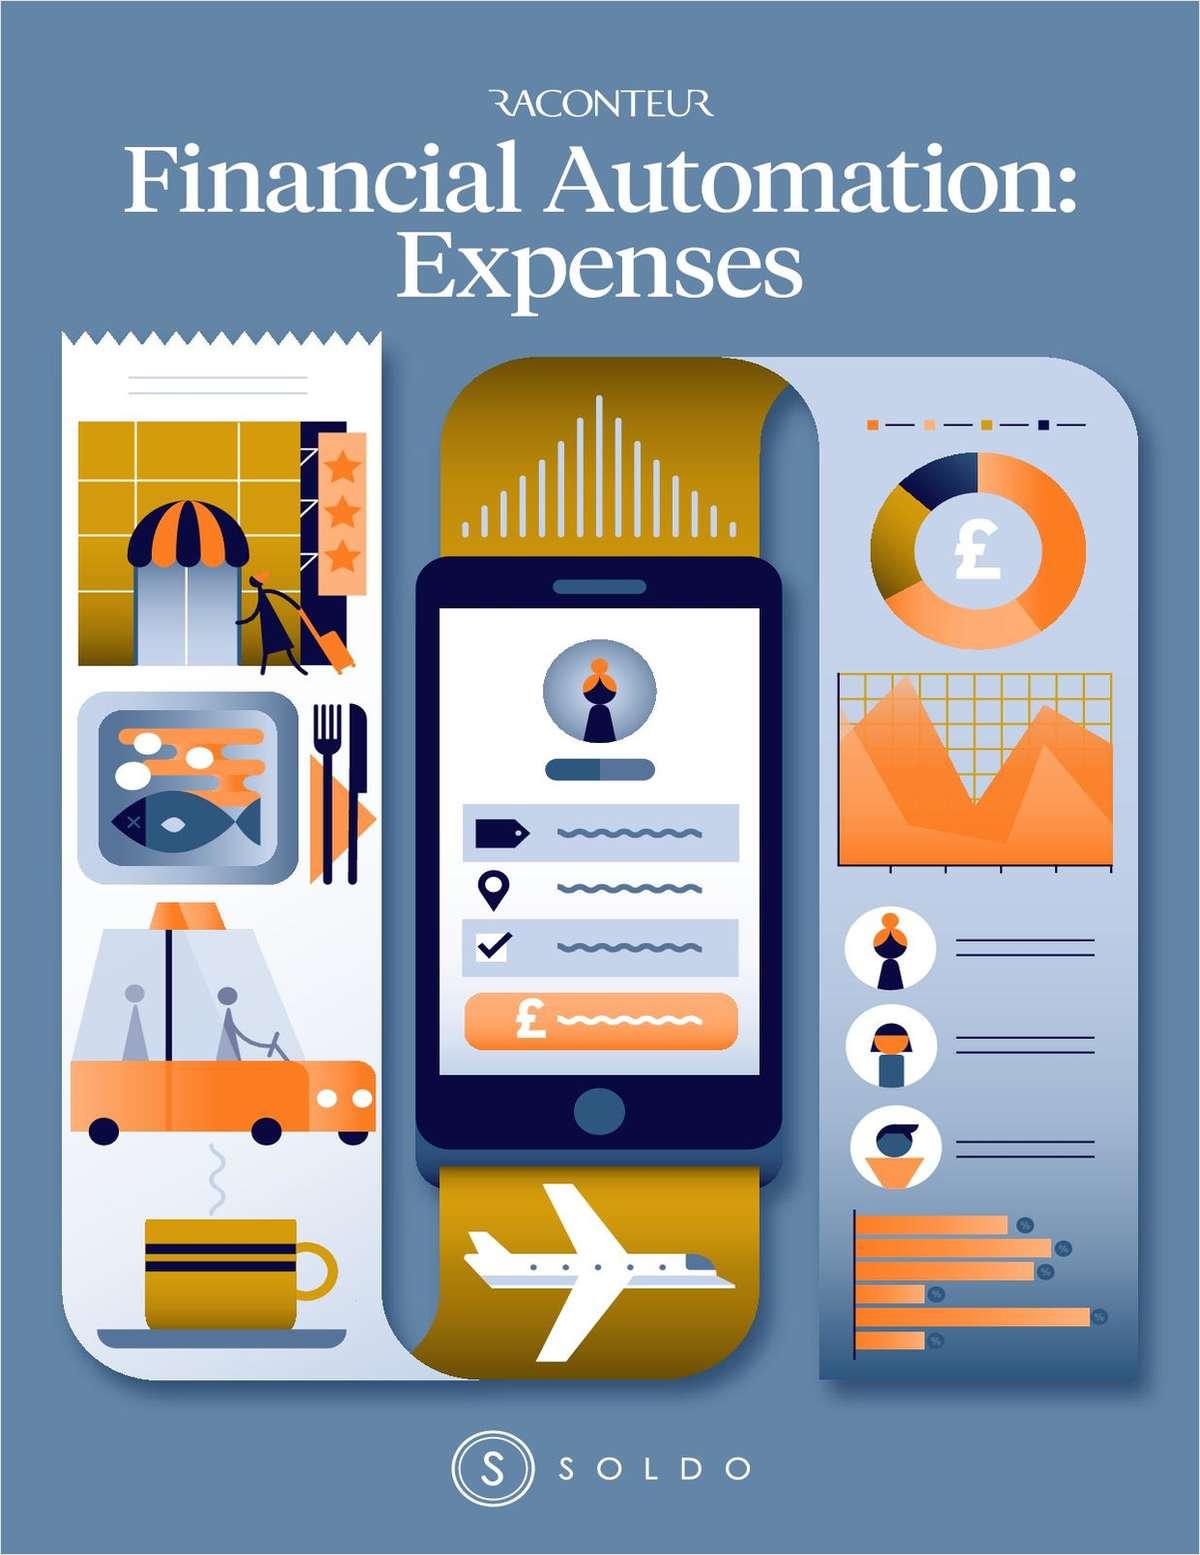 Raconteur Financial Automation: Expenses